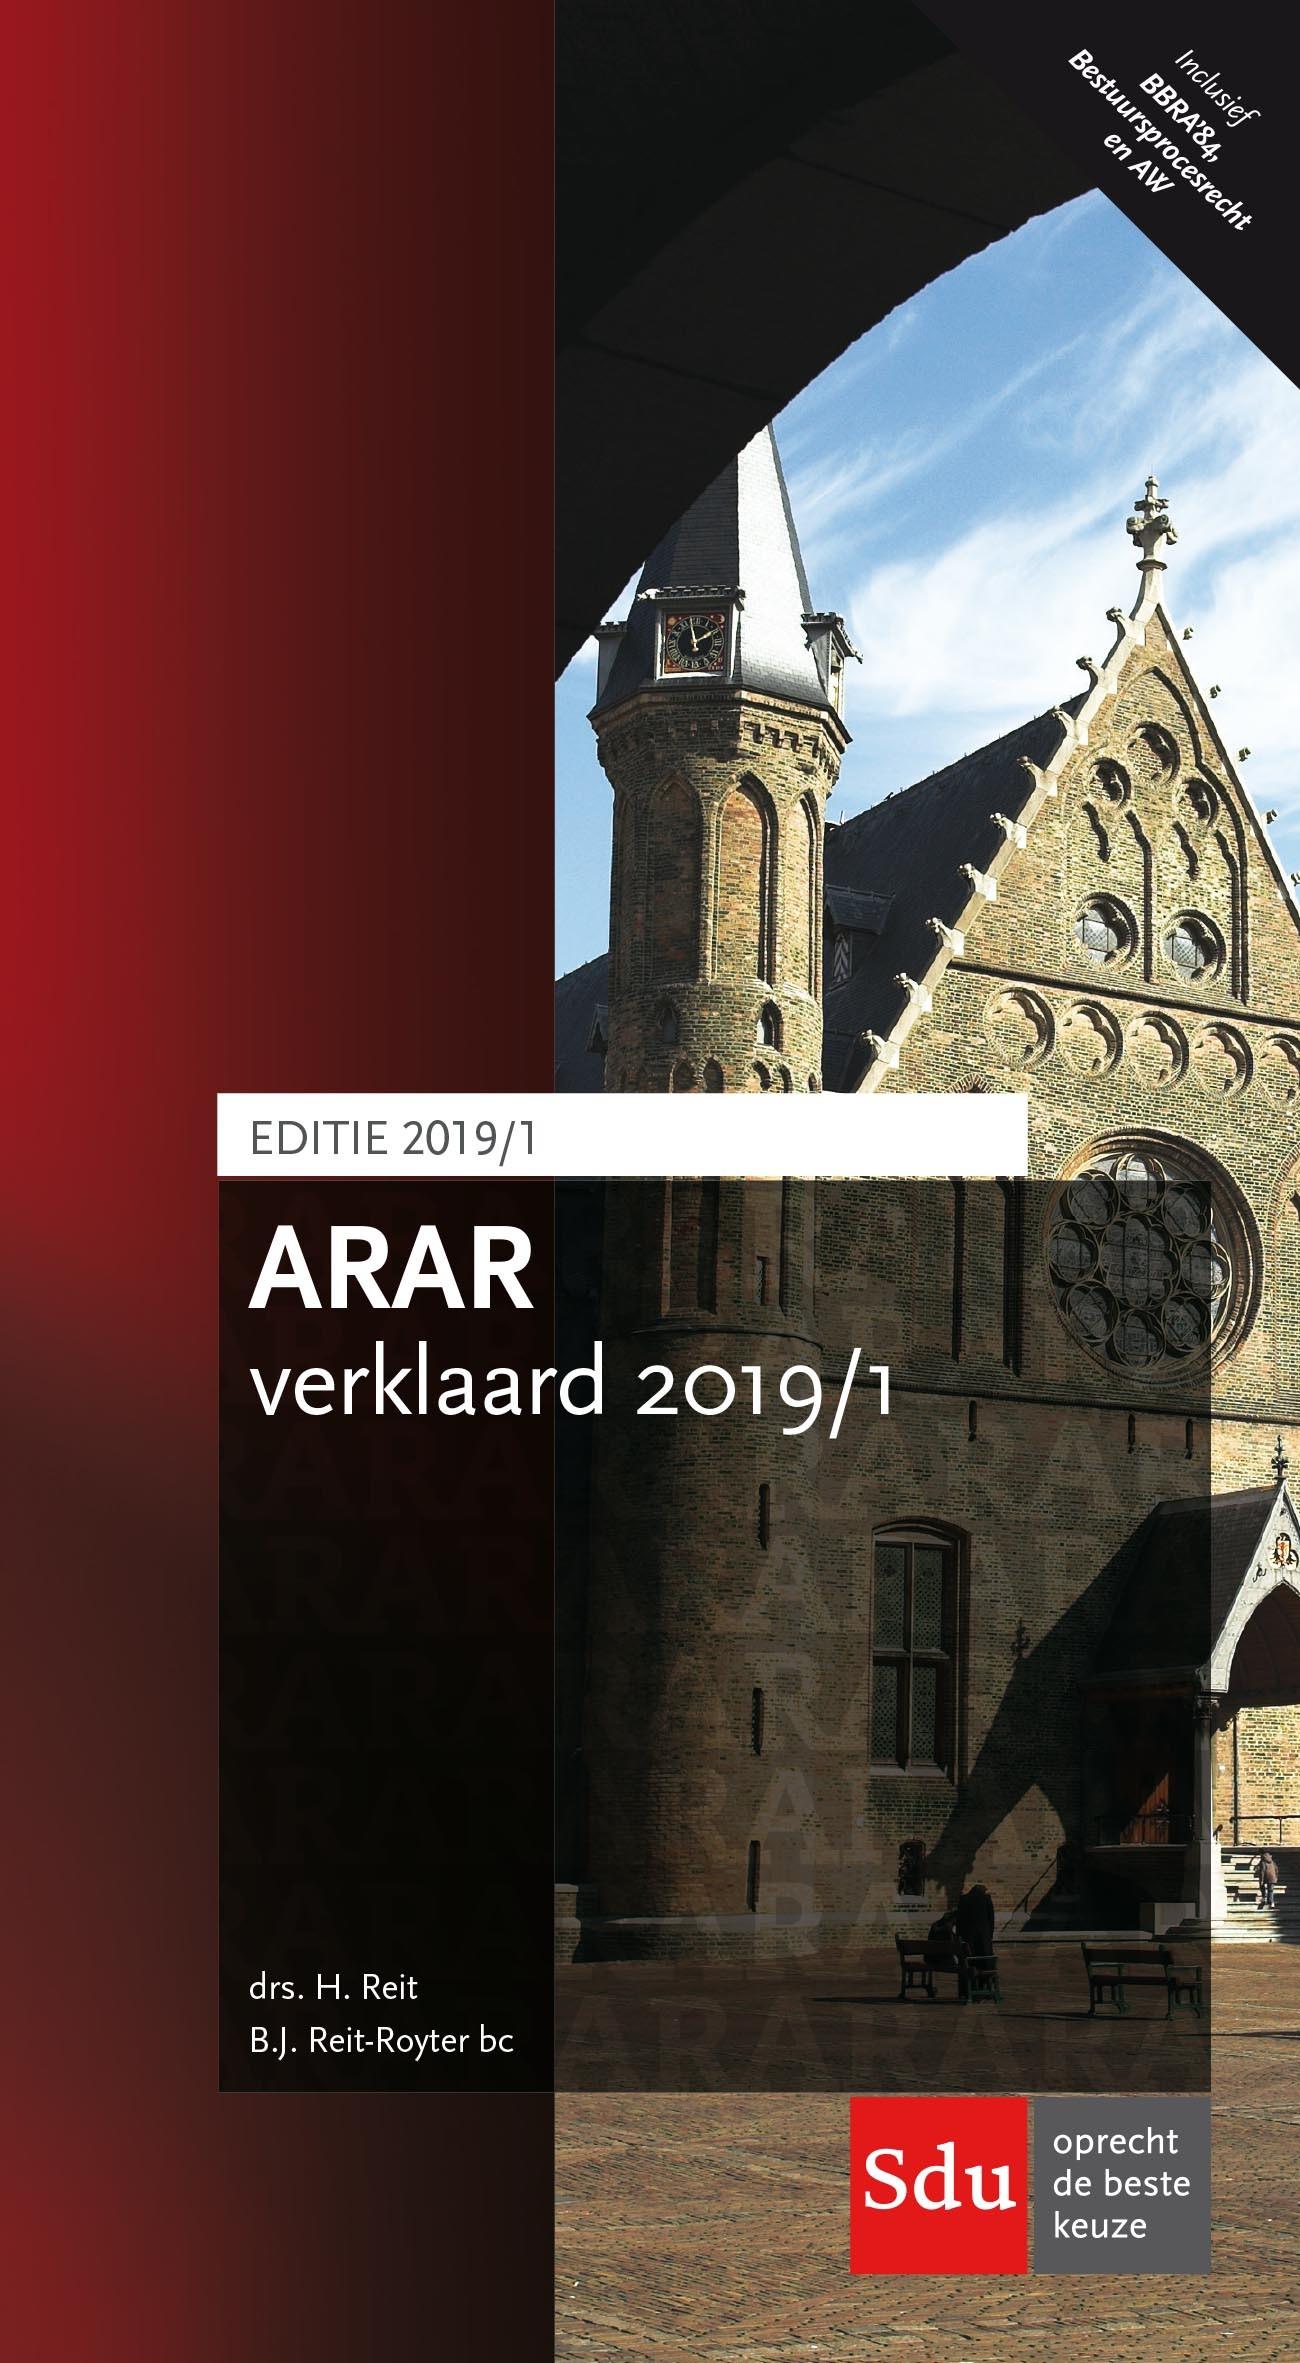 ARAR Verklaard 2019 - 01